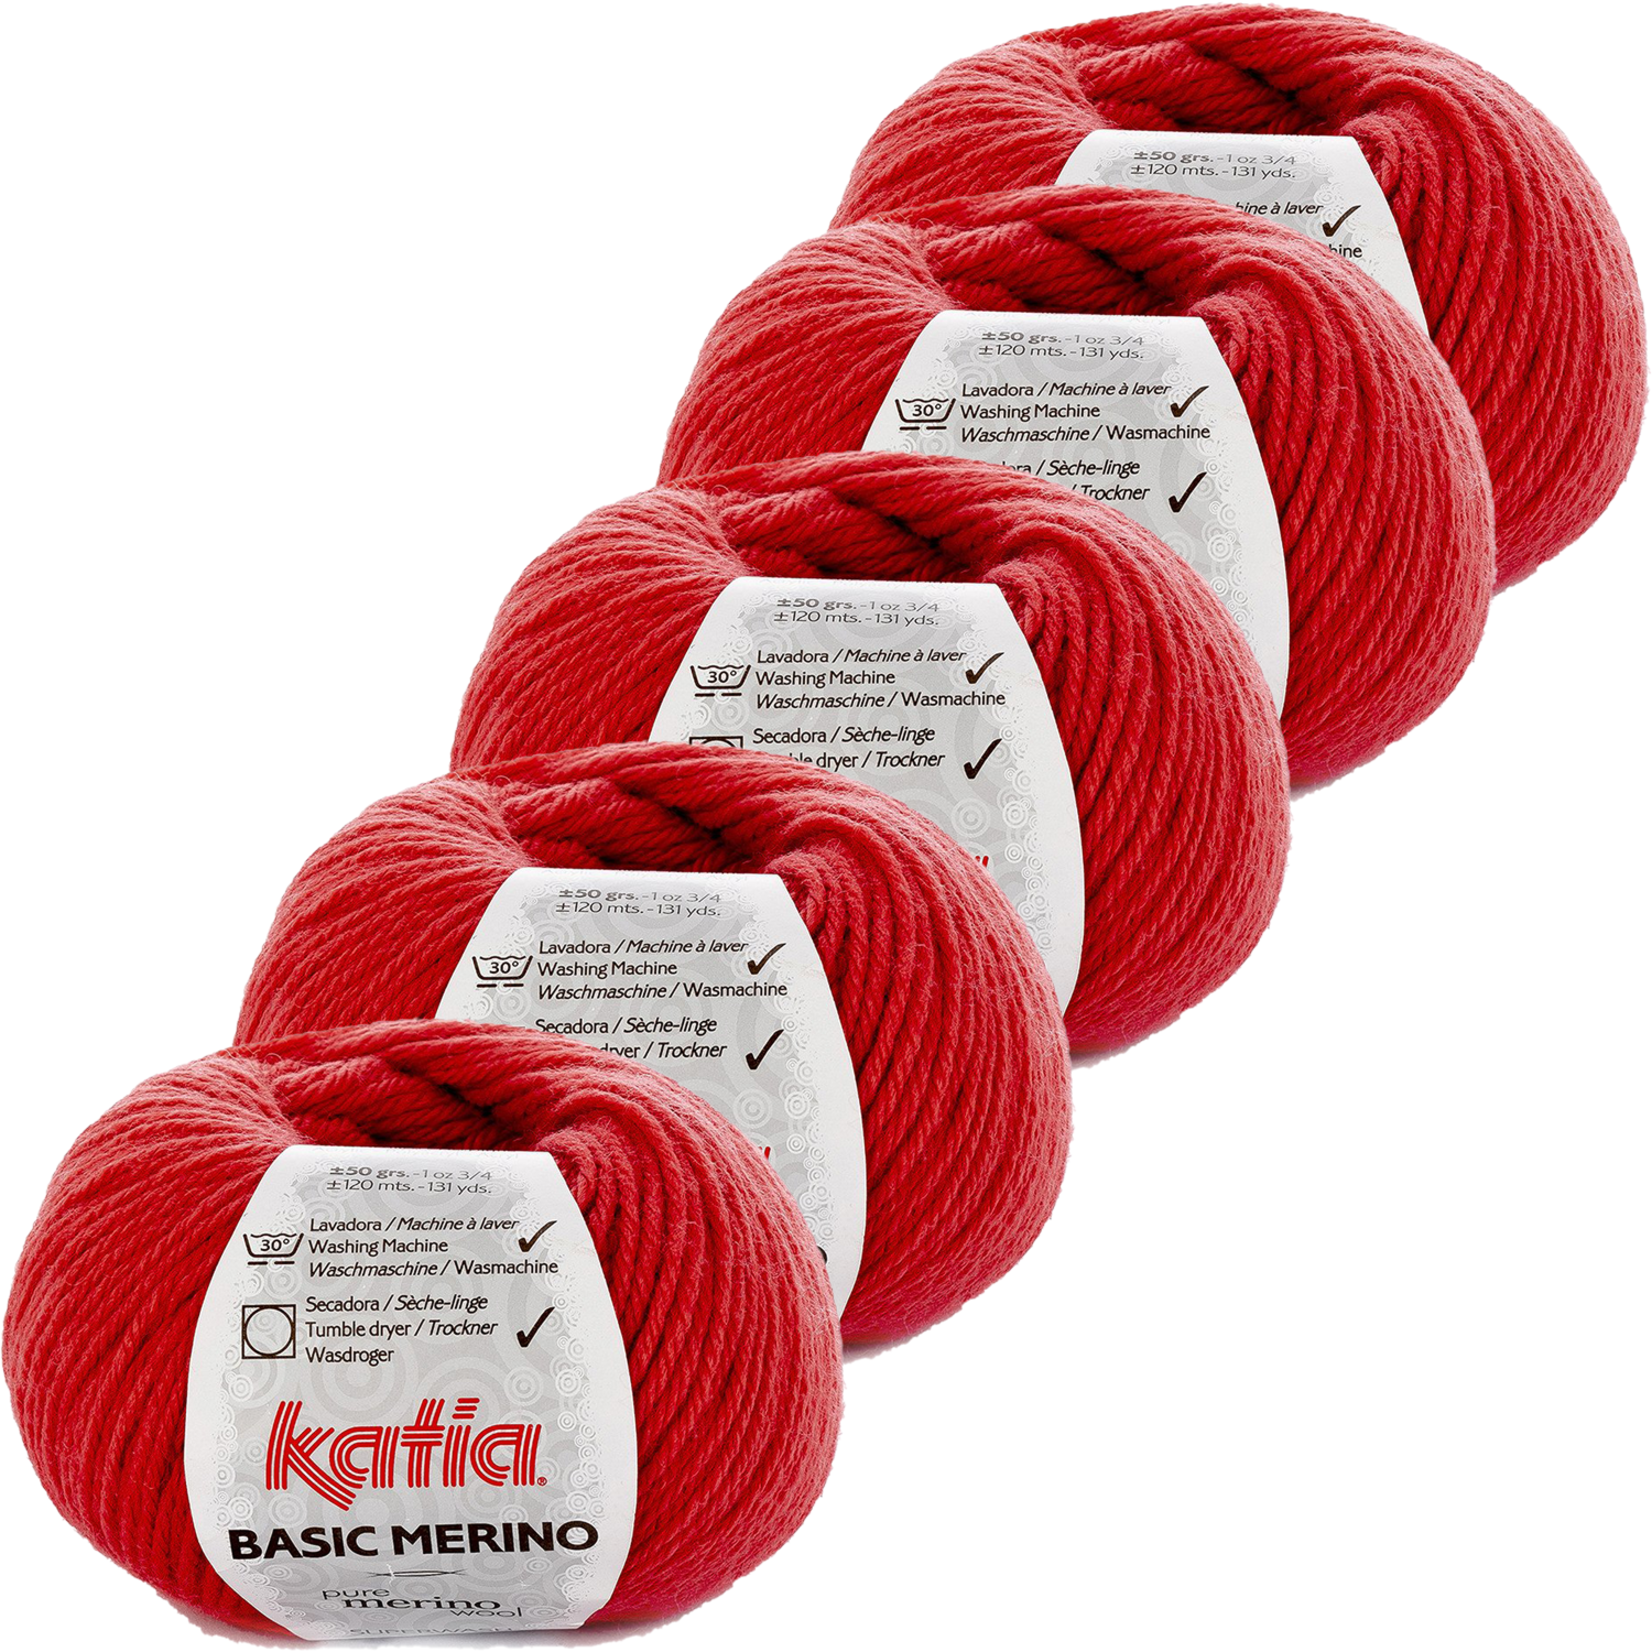 Katia Basic Merino - kleur 66_Koraal - bundel 5 bollen 50 gr.  van 120 m.